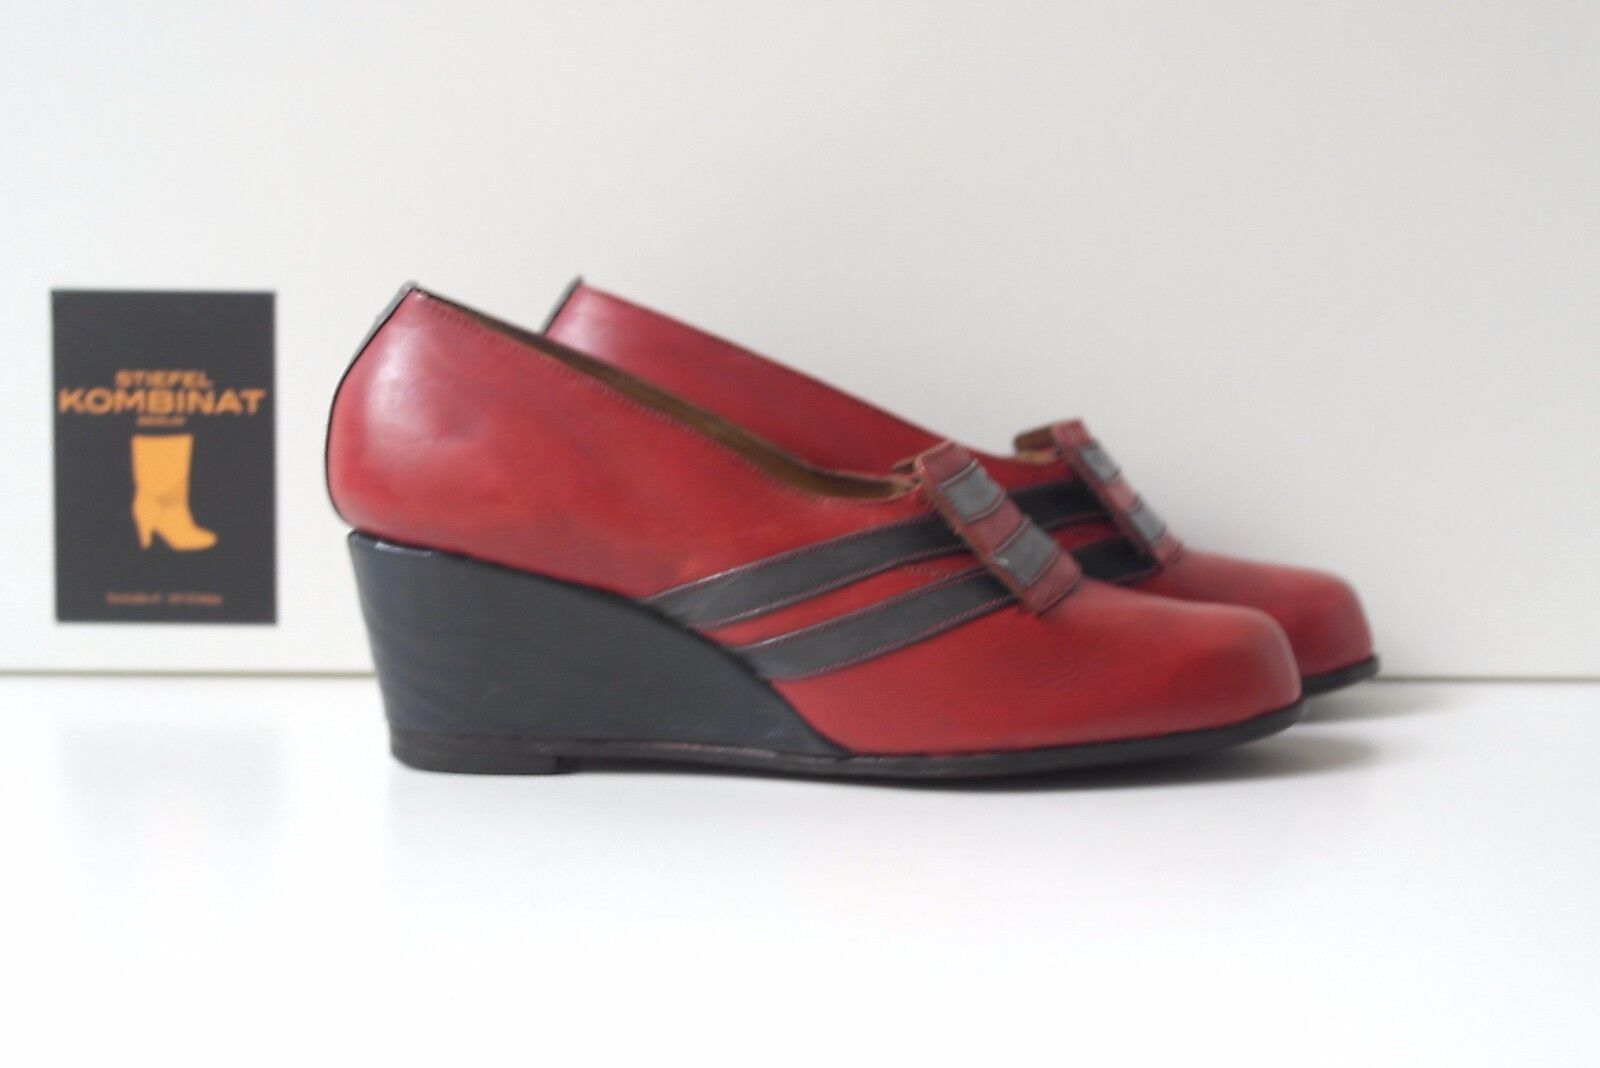 Antik Antik Antik Damen Pumps Wedges Keilabsatz Schuhe TRUE VINTAGE Halbschuhe rot blau a30af5